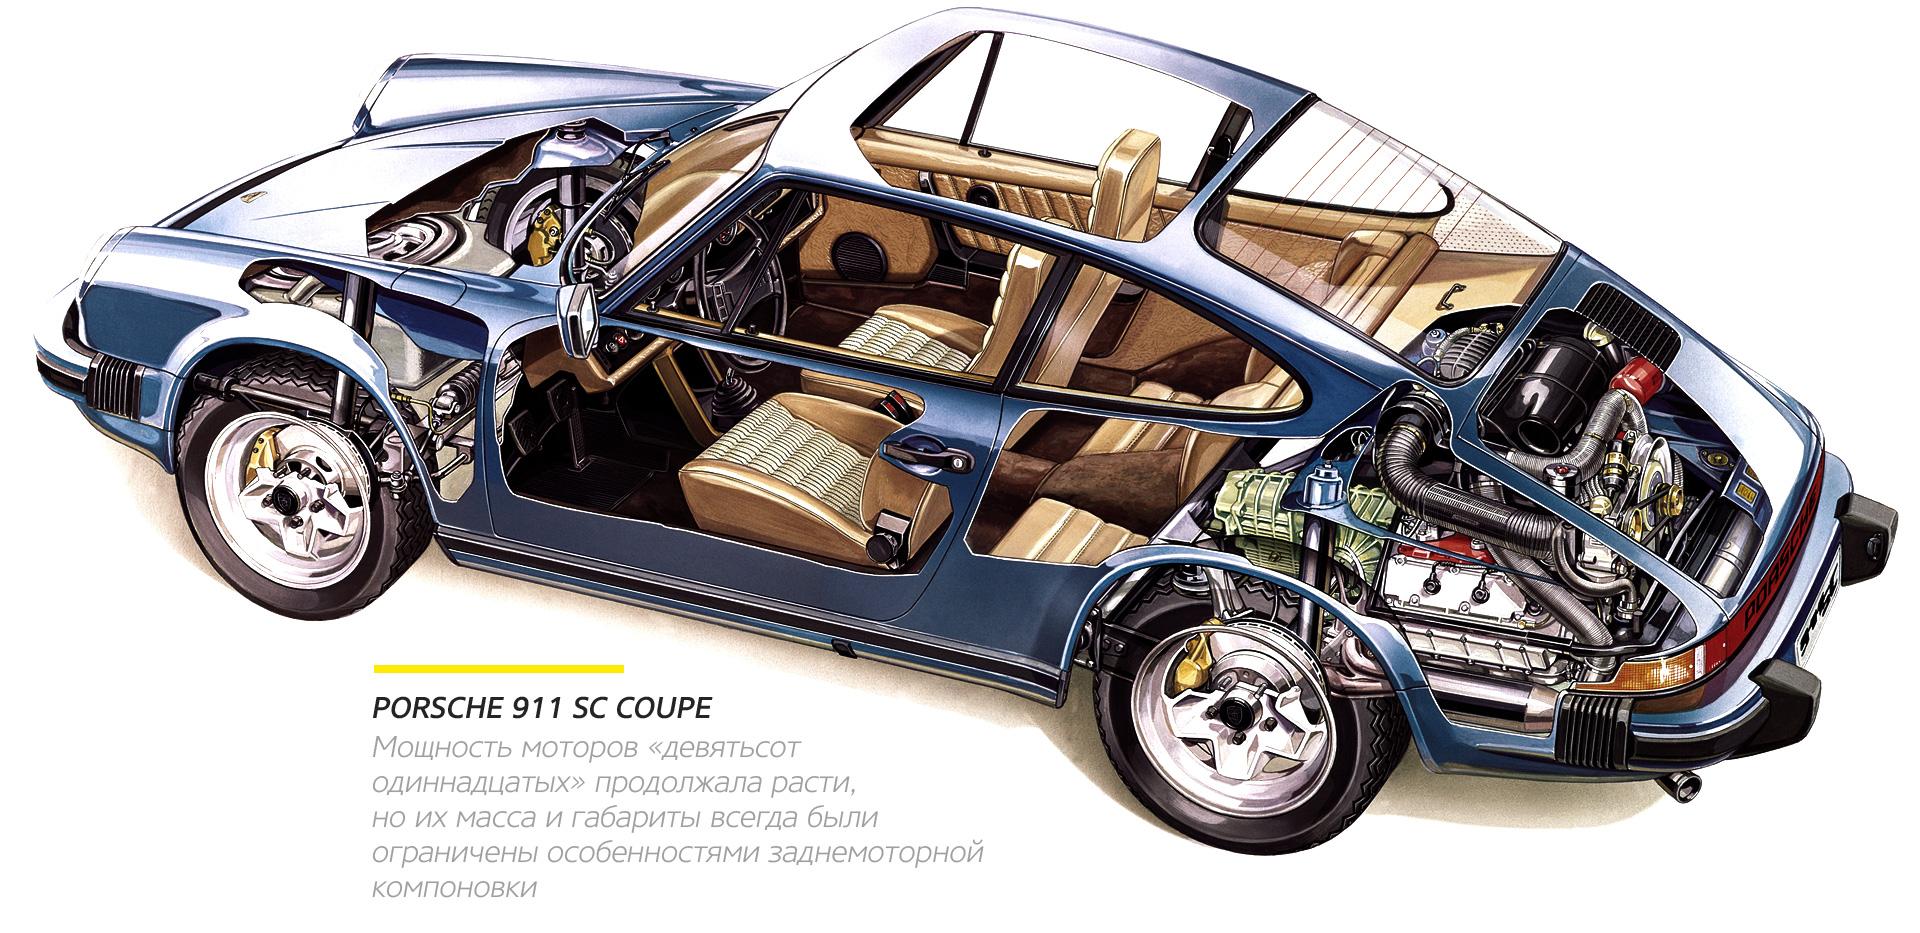 Как Porsche 911 получил приставку Turbo и изменил мир. Фото 2